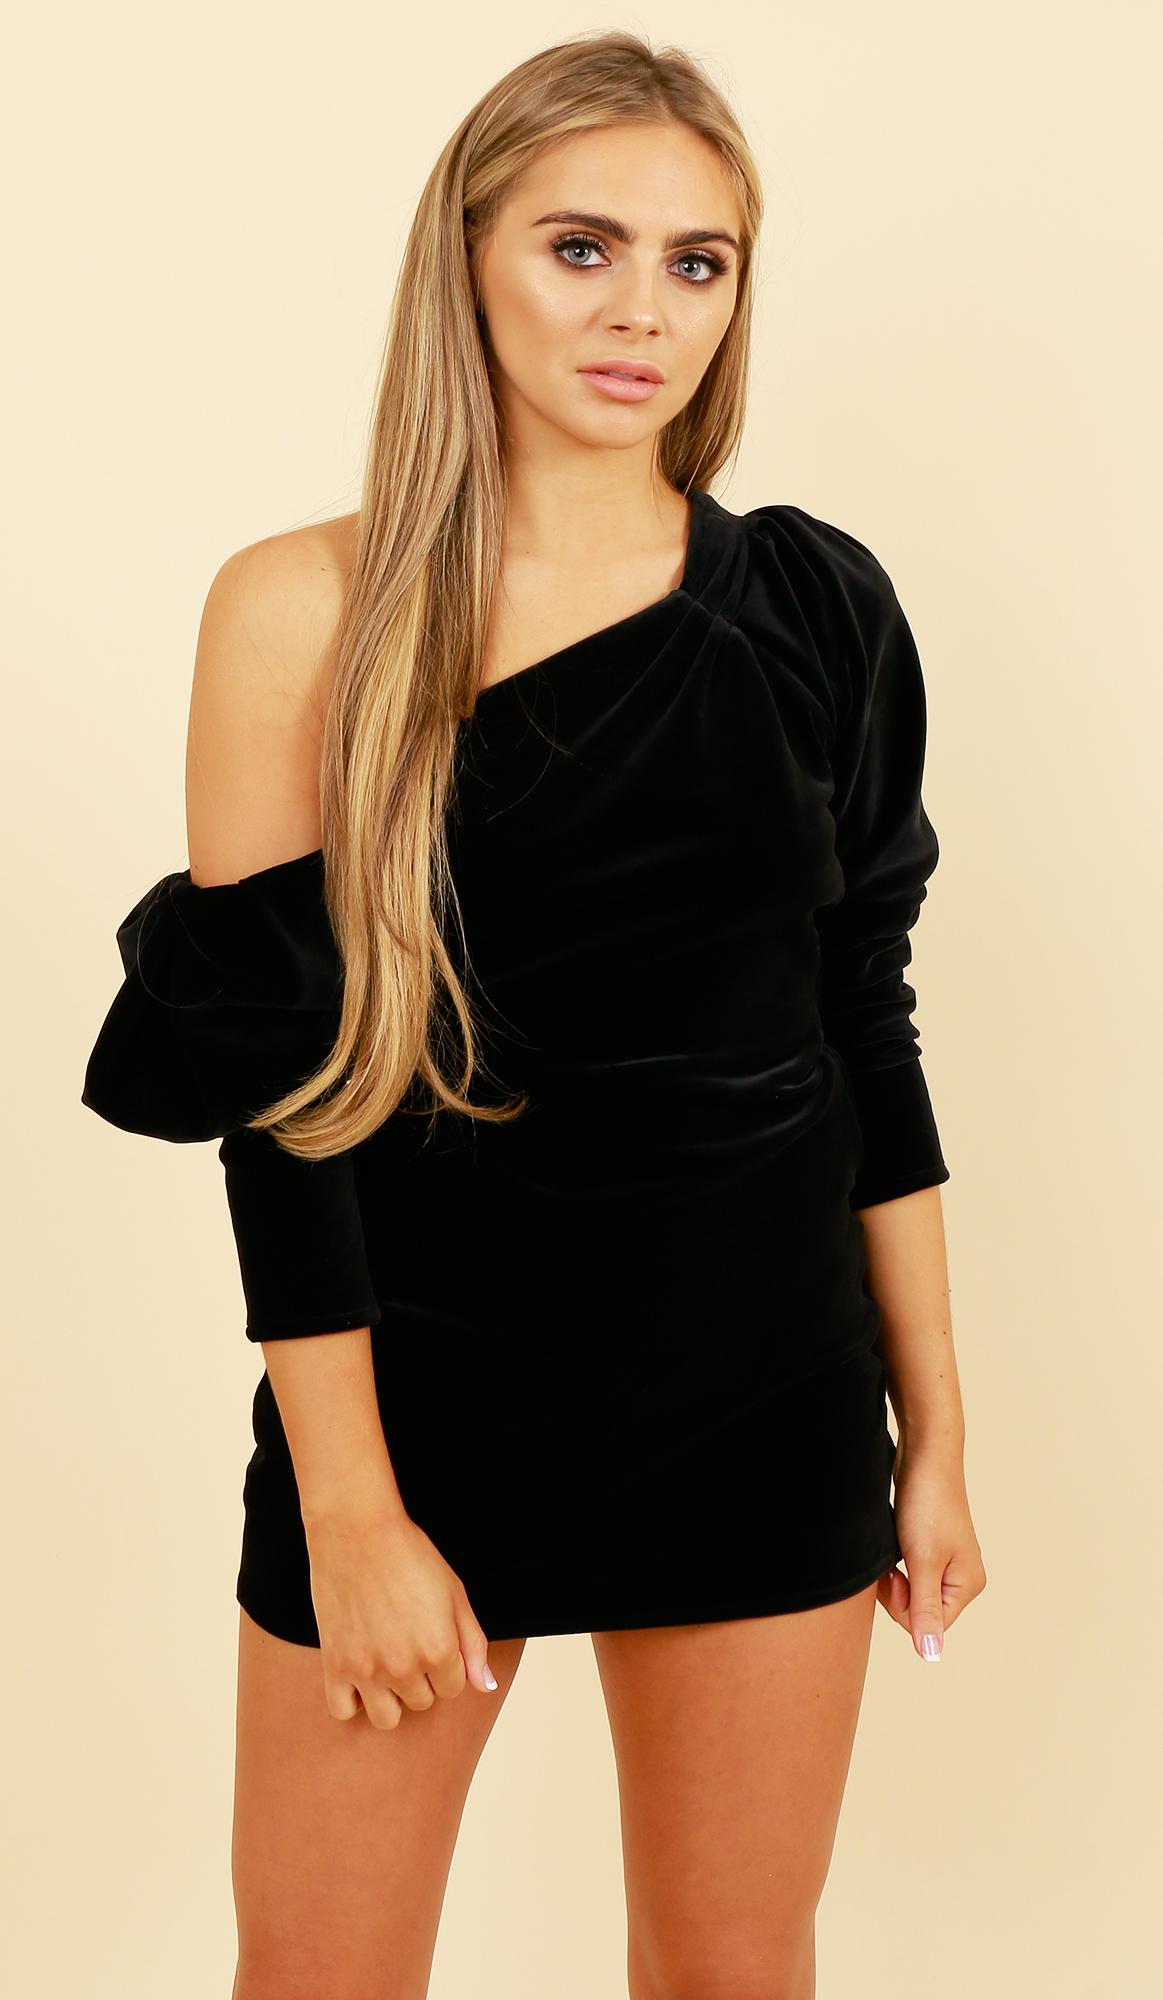 f72380ed8858 One Shoulder Puff Sleeve Dress  Black Velvet - Lola Loves Boutique